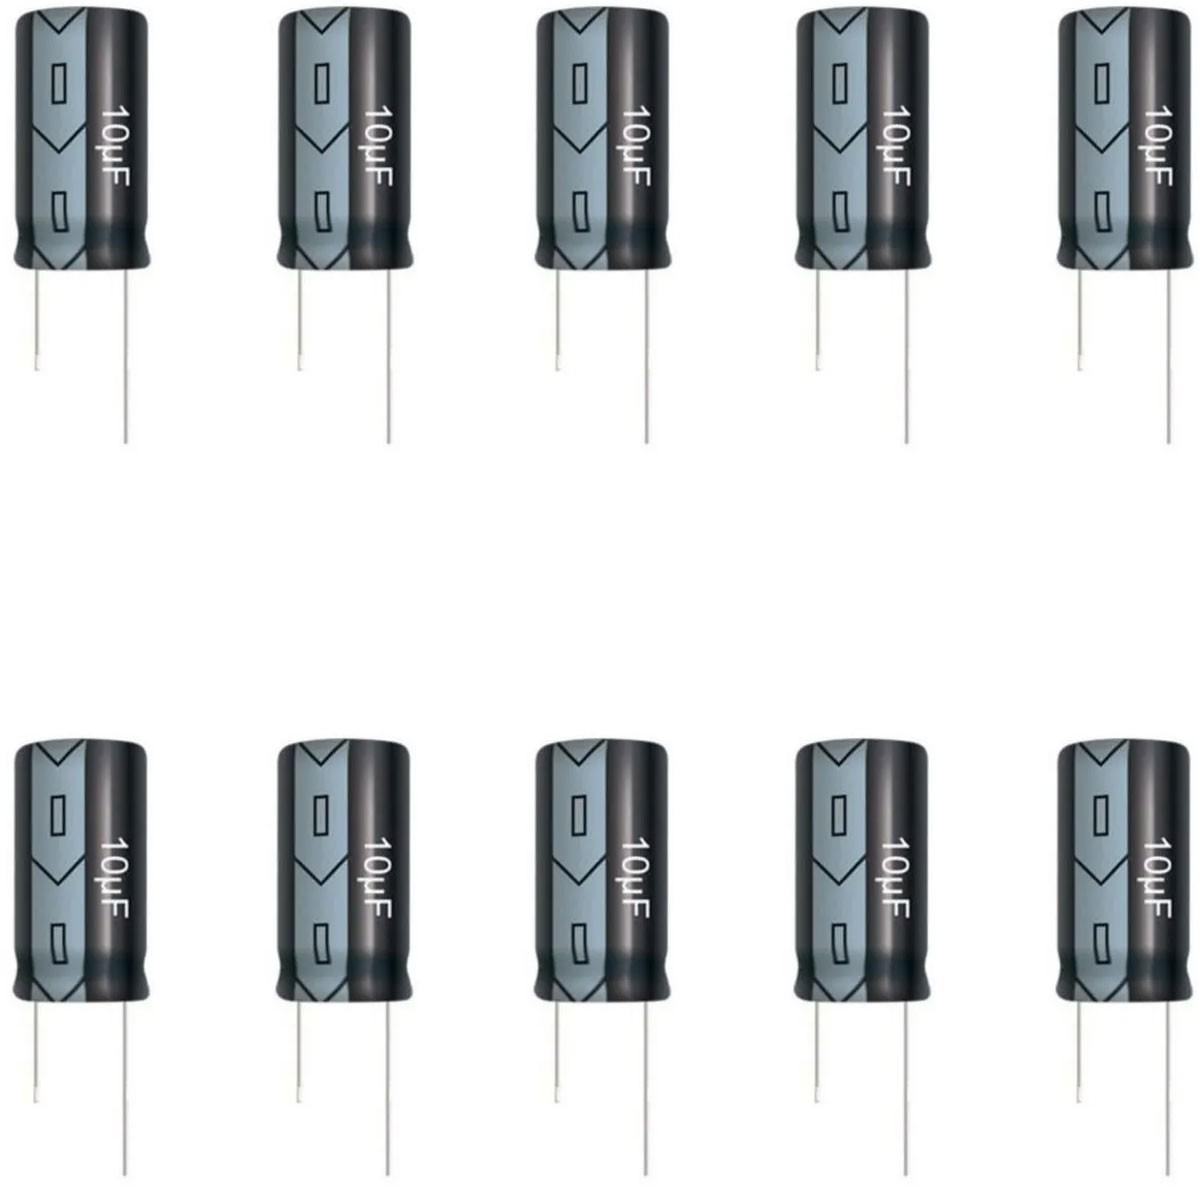 10x Capacitor Eletrolitico 10uF 25V 105°C